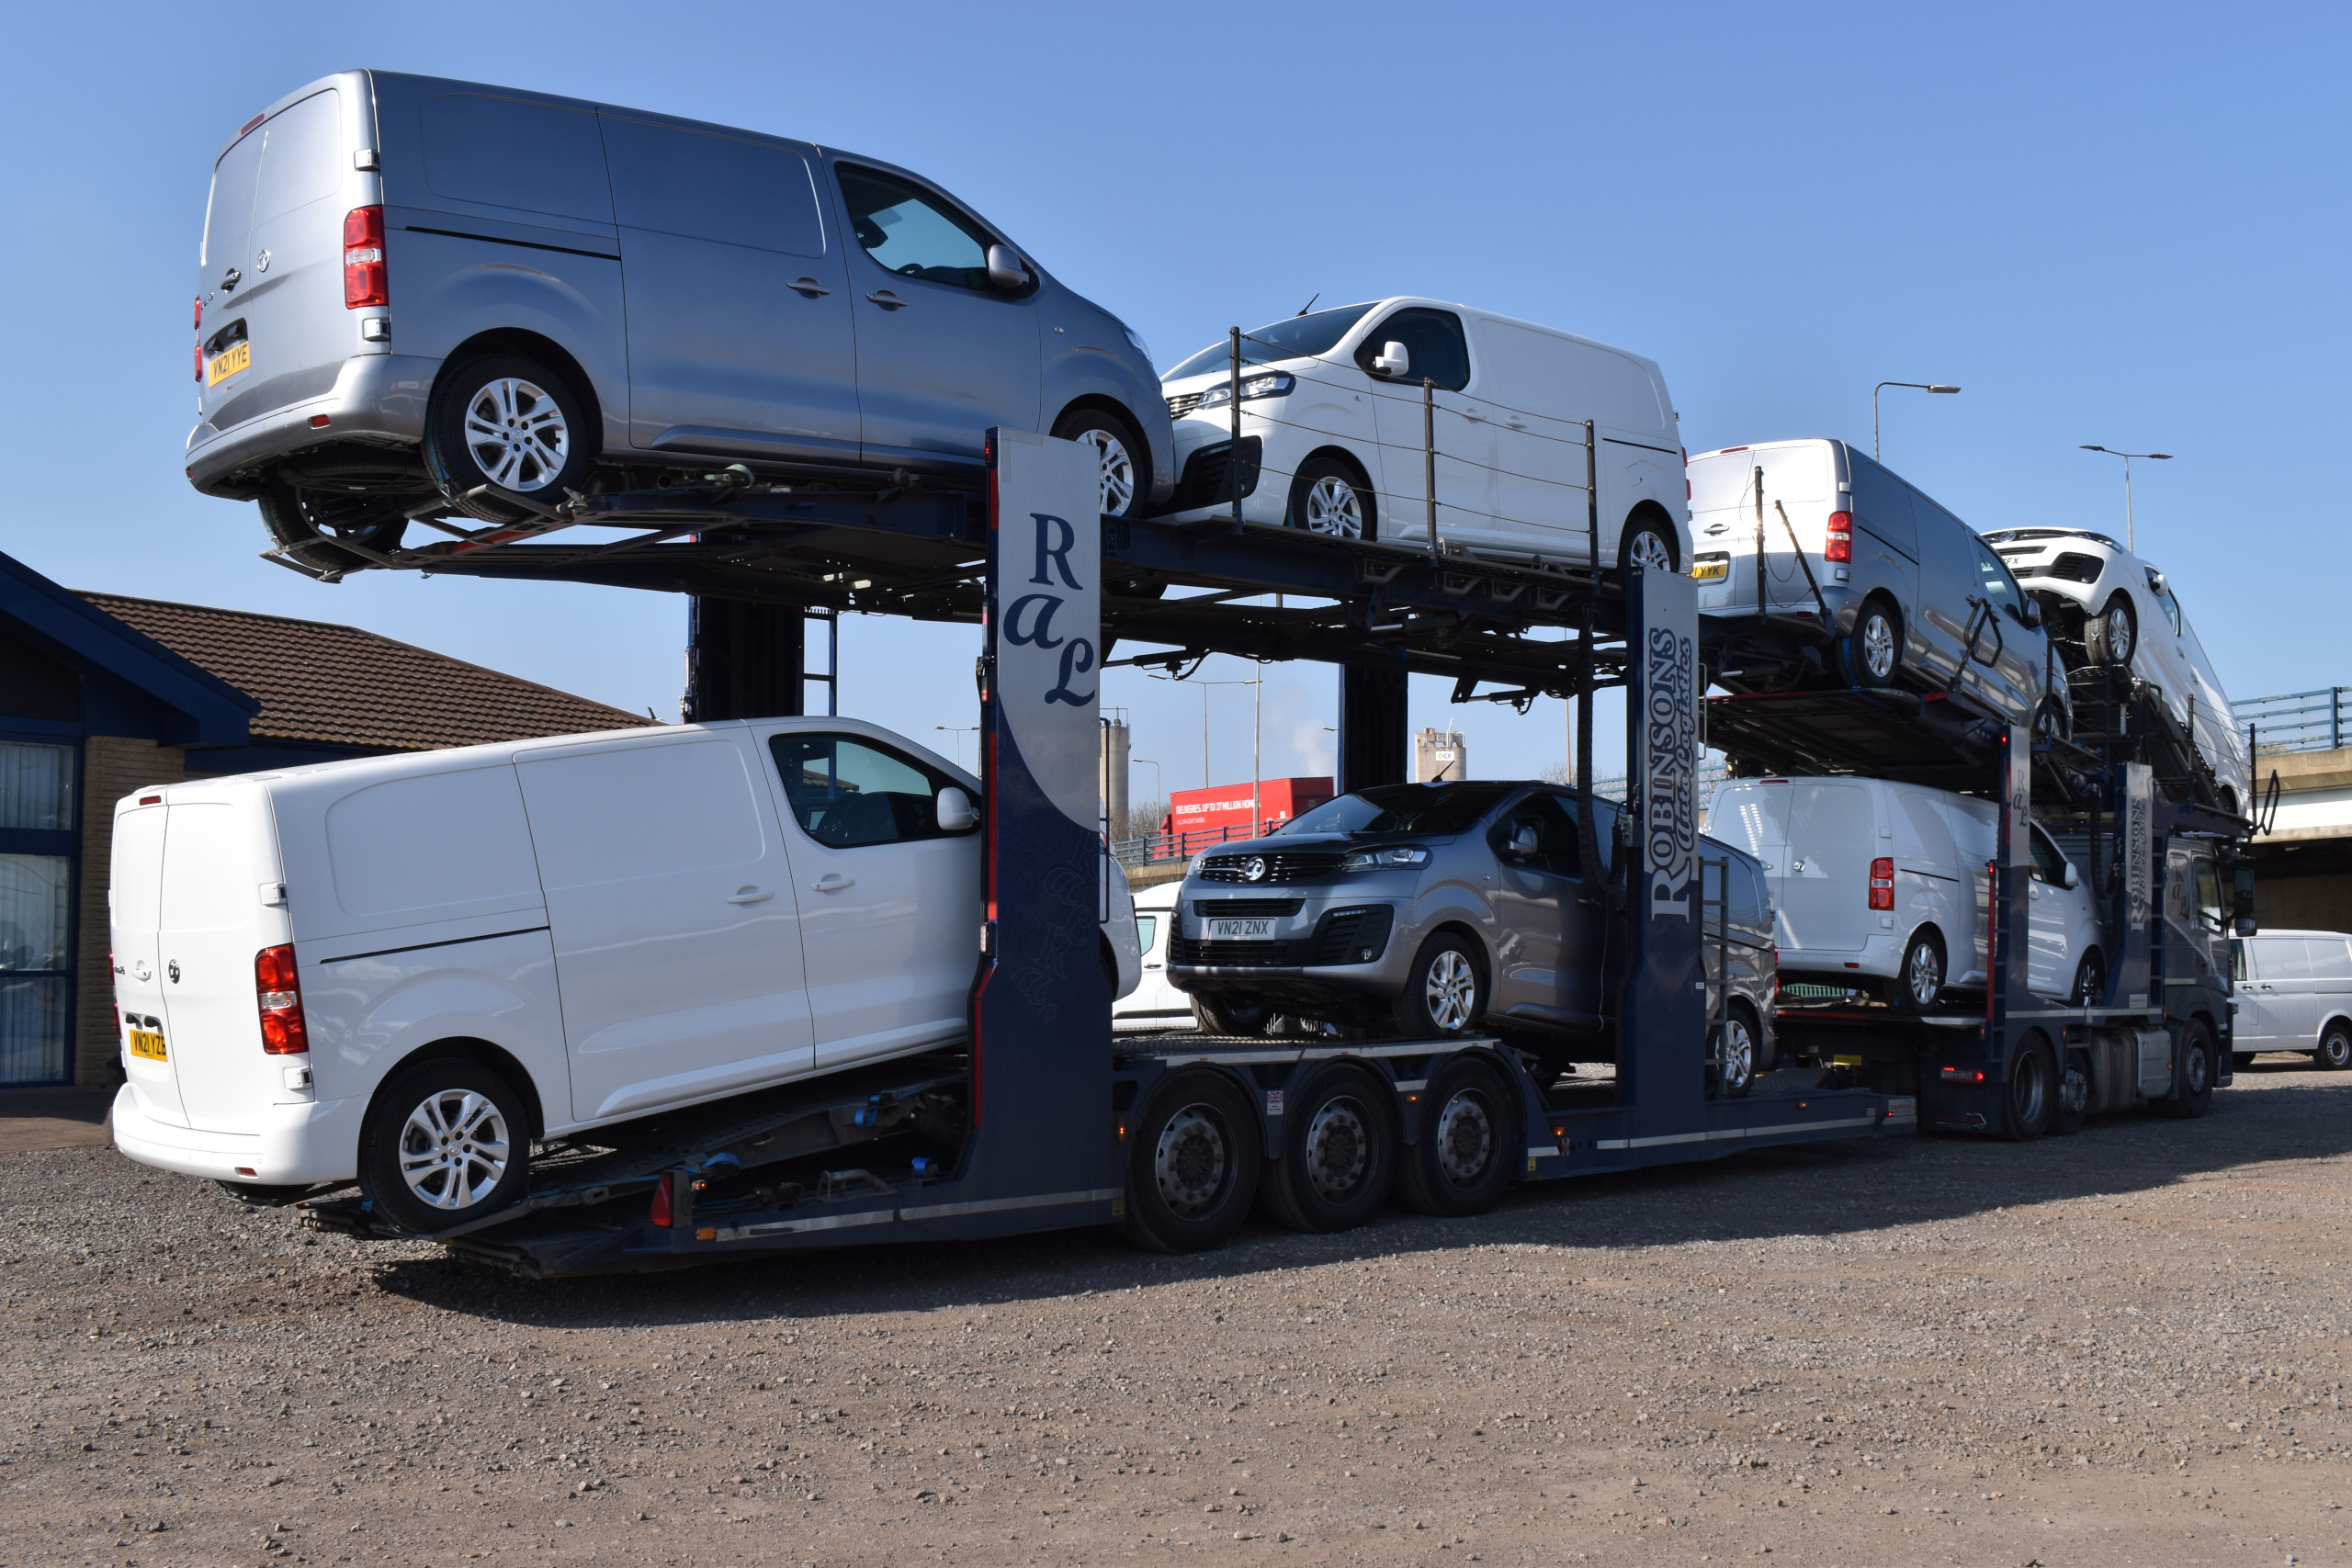 Vauxhall Vivaro on Transporter